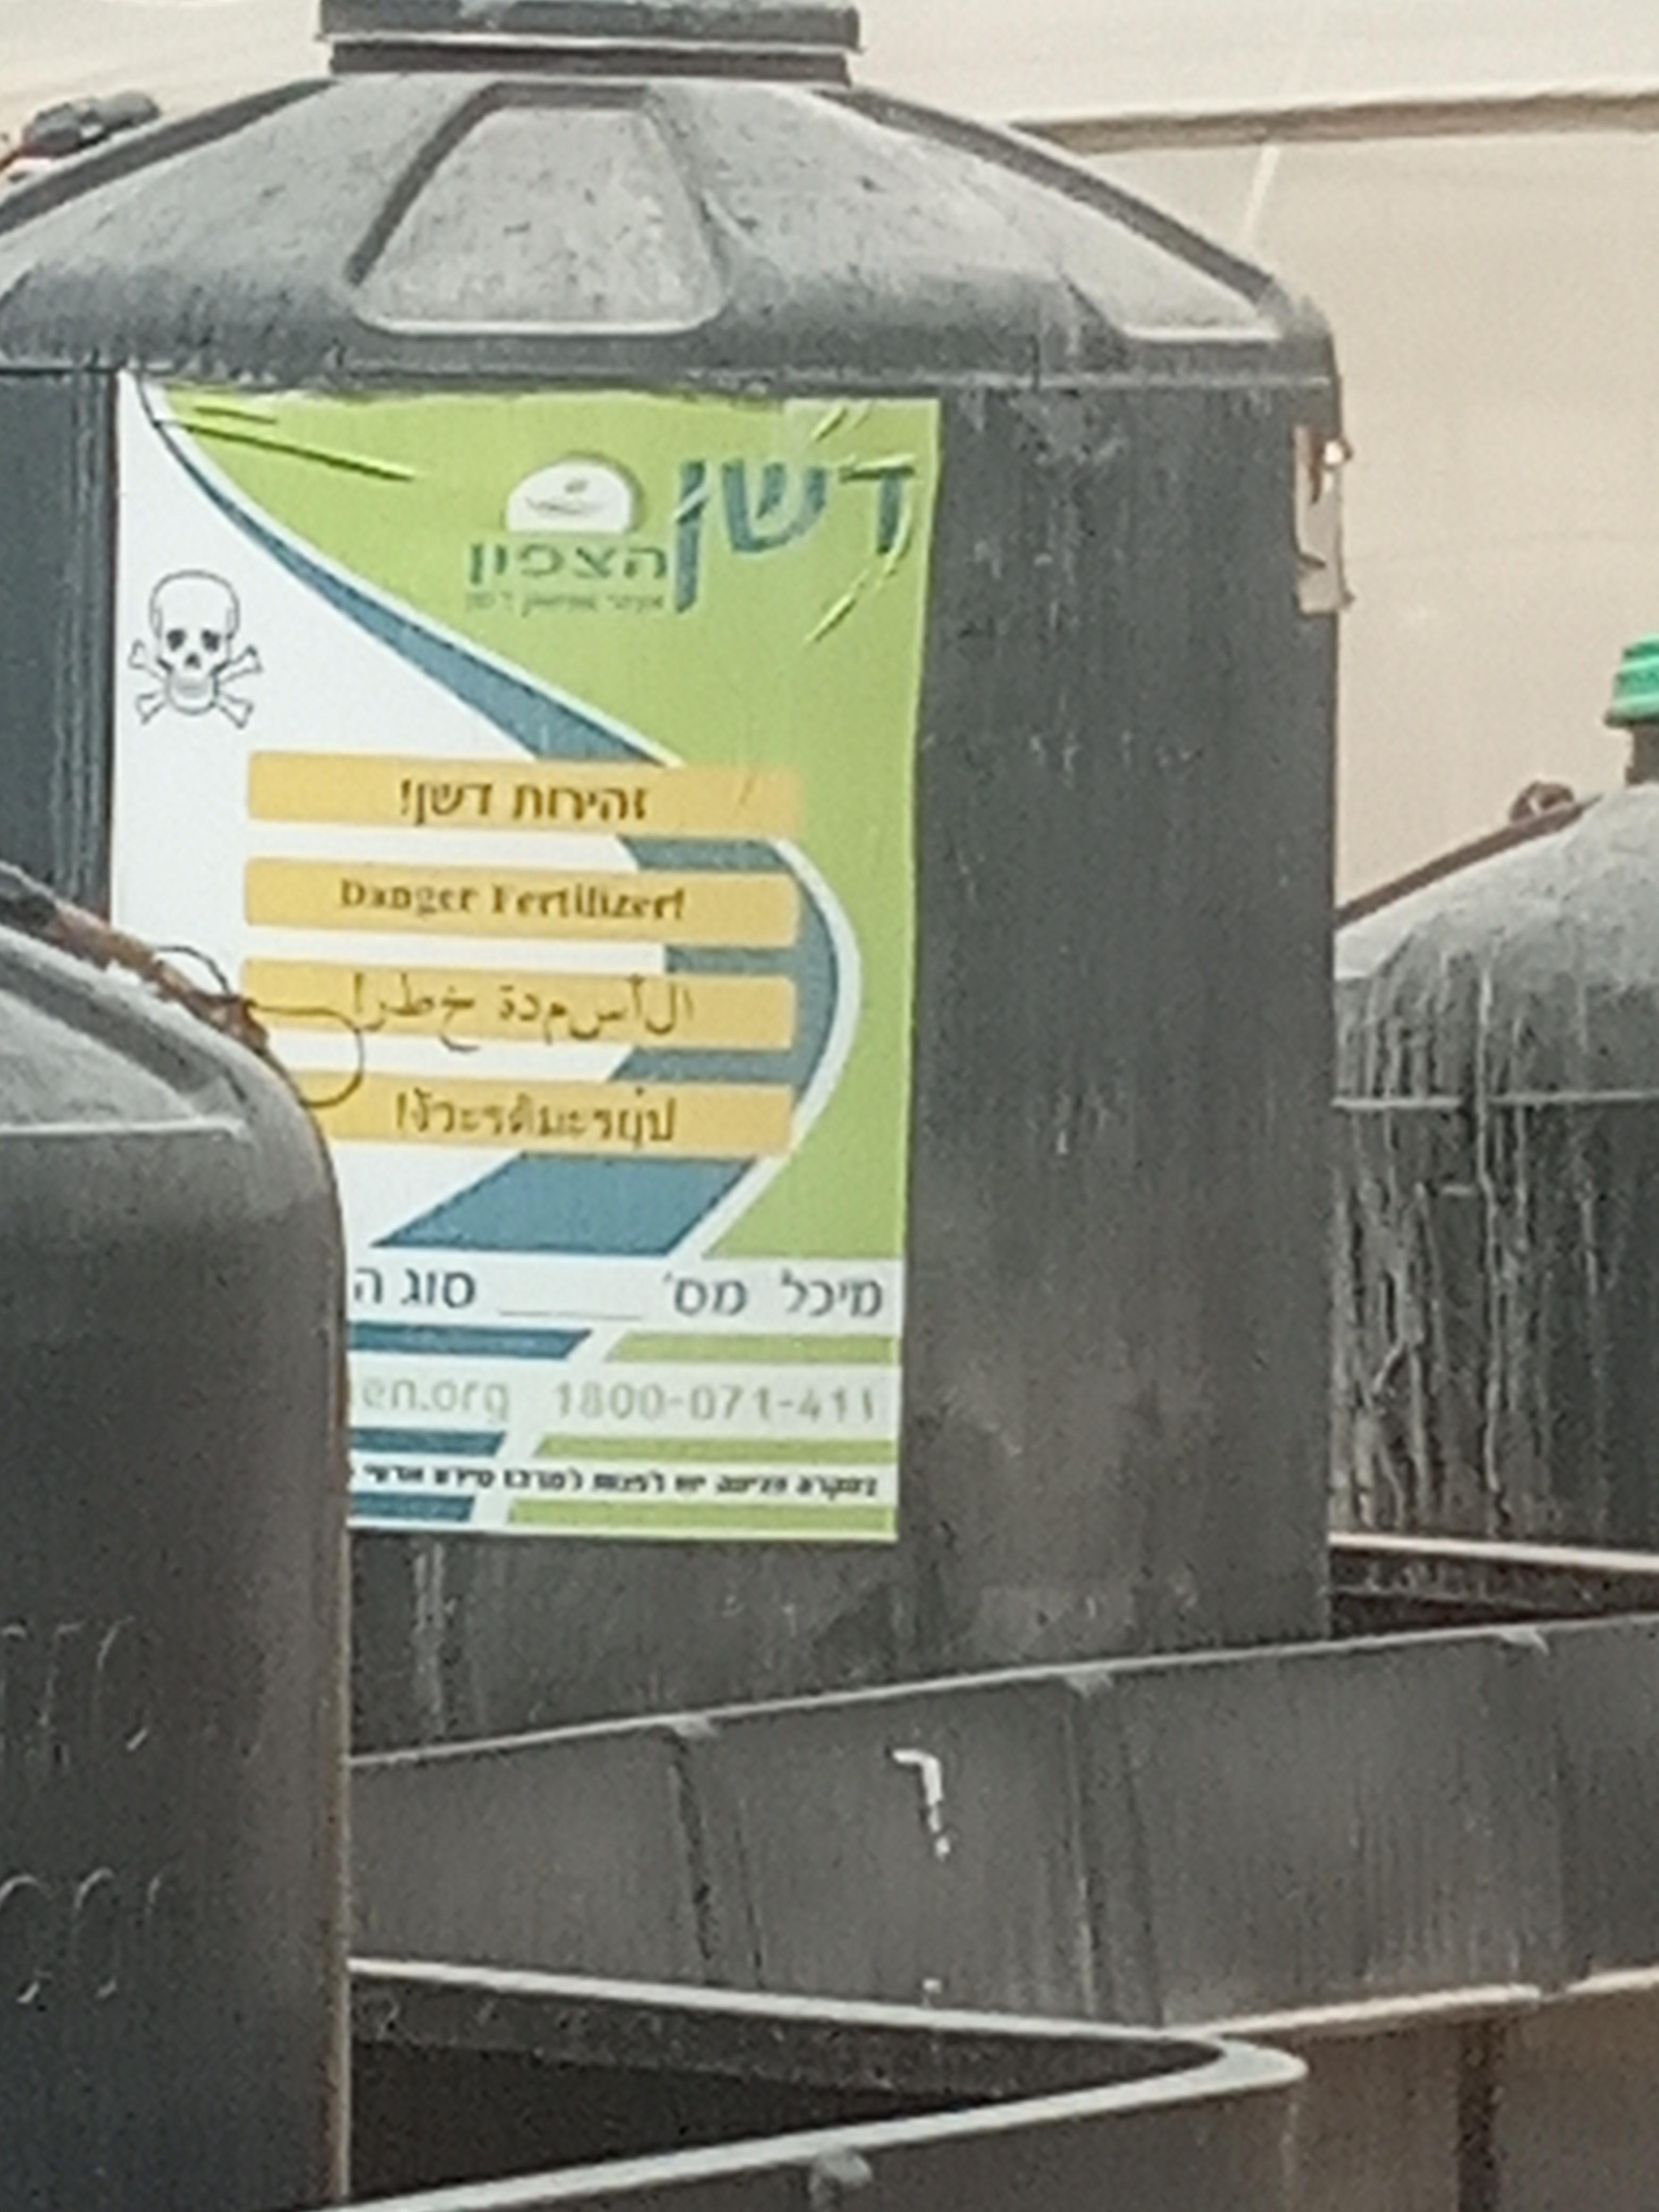 Deshen Hatzafon Production And Marketing Of Fertilizer